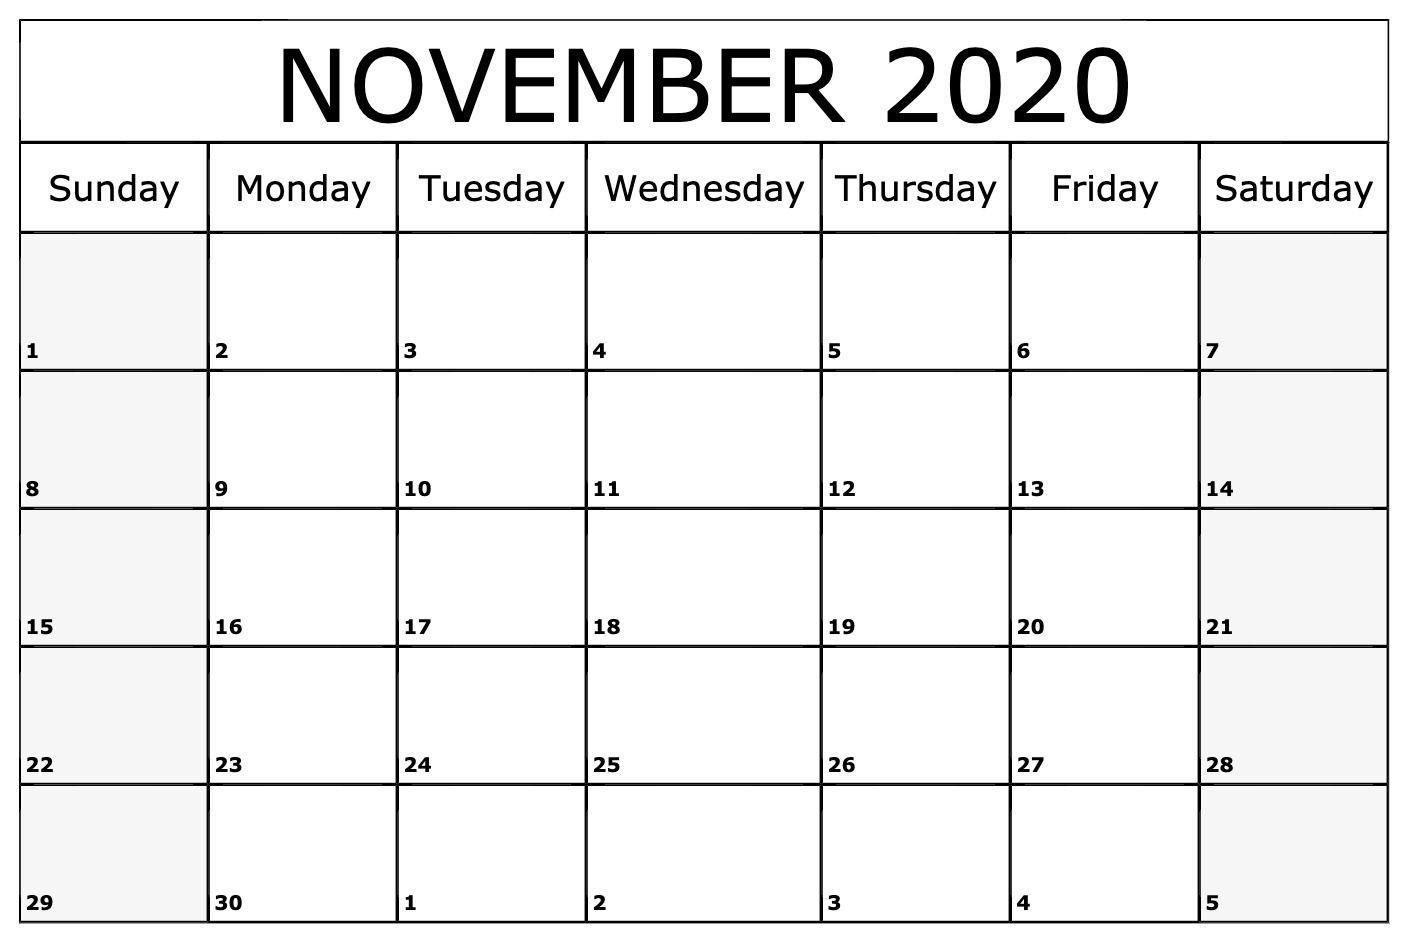 Calendar Monthly November 2020 | Calendar Ideas Design Creative inside November 2020 Calendar Beta Calendars